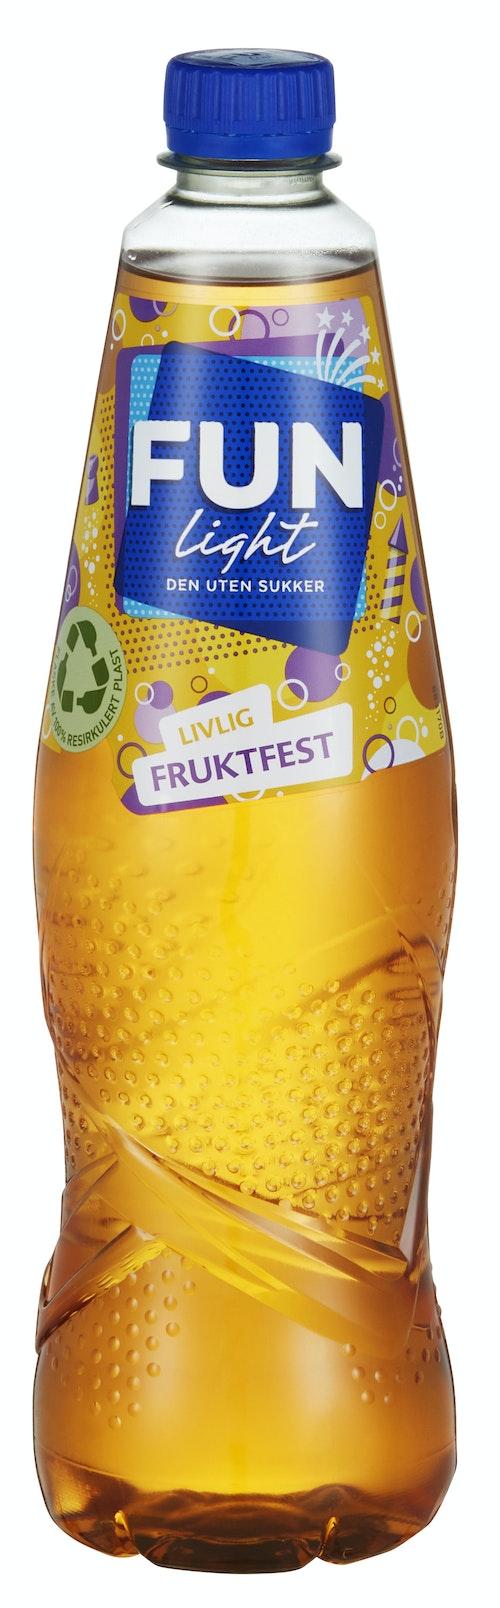 Fun Light Fun Light Fruktfest 0,8 l